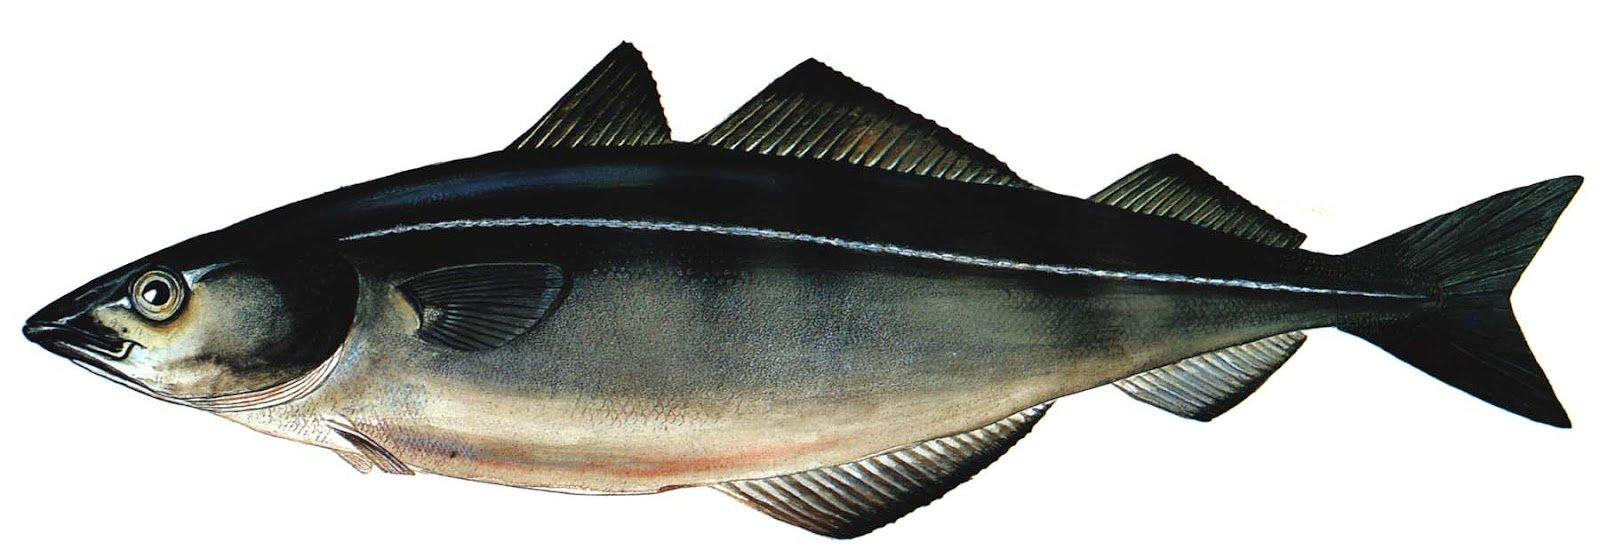 какую рыбу ловят на технопланктон